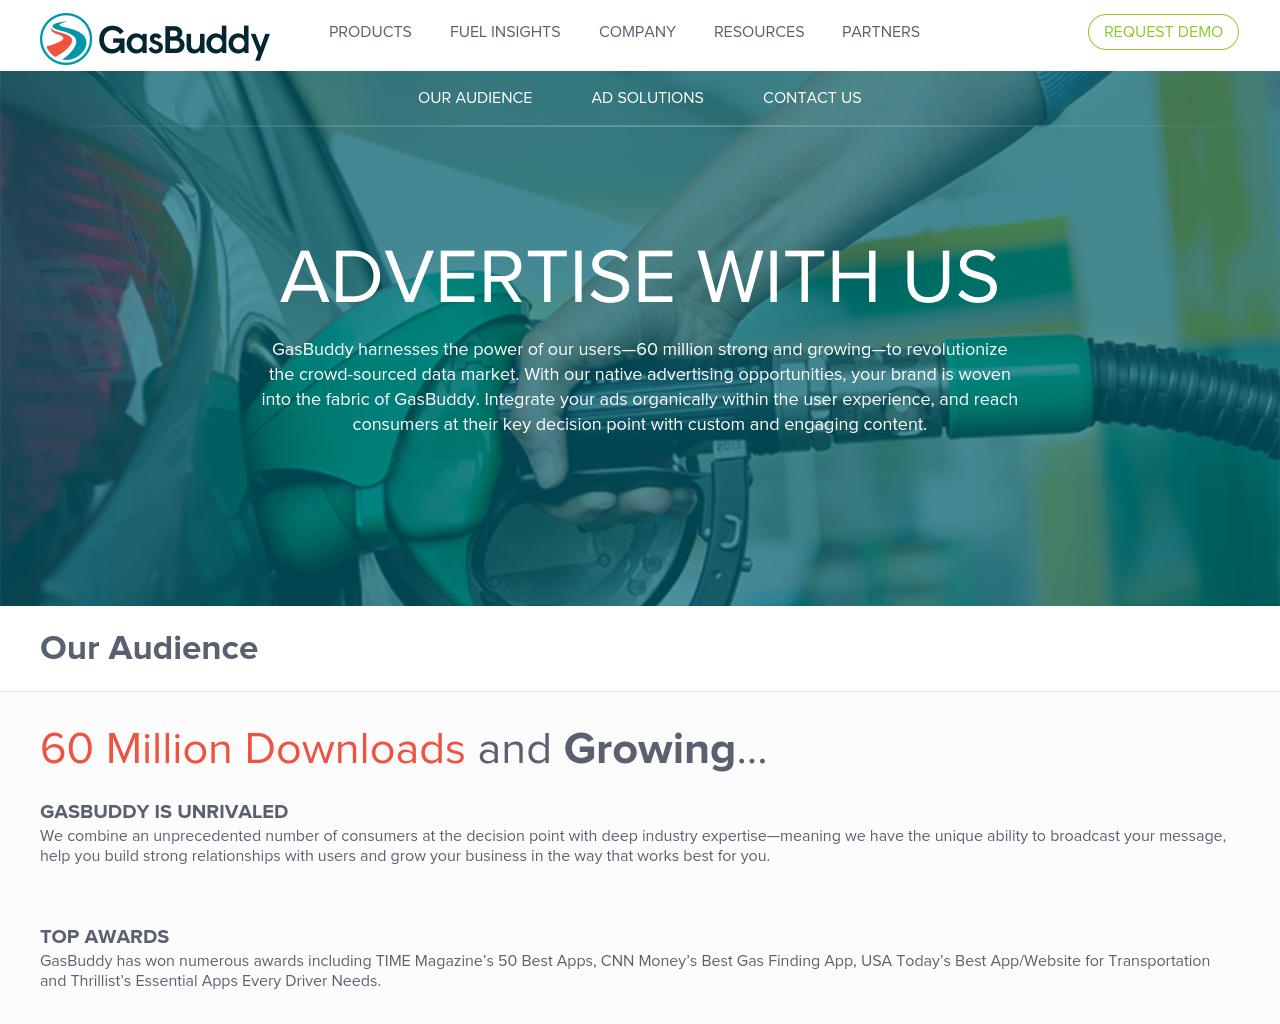 Ohio-GasBuddy-Advertising-Reviews-Pricing